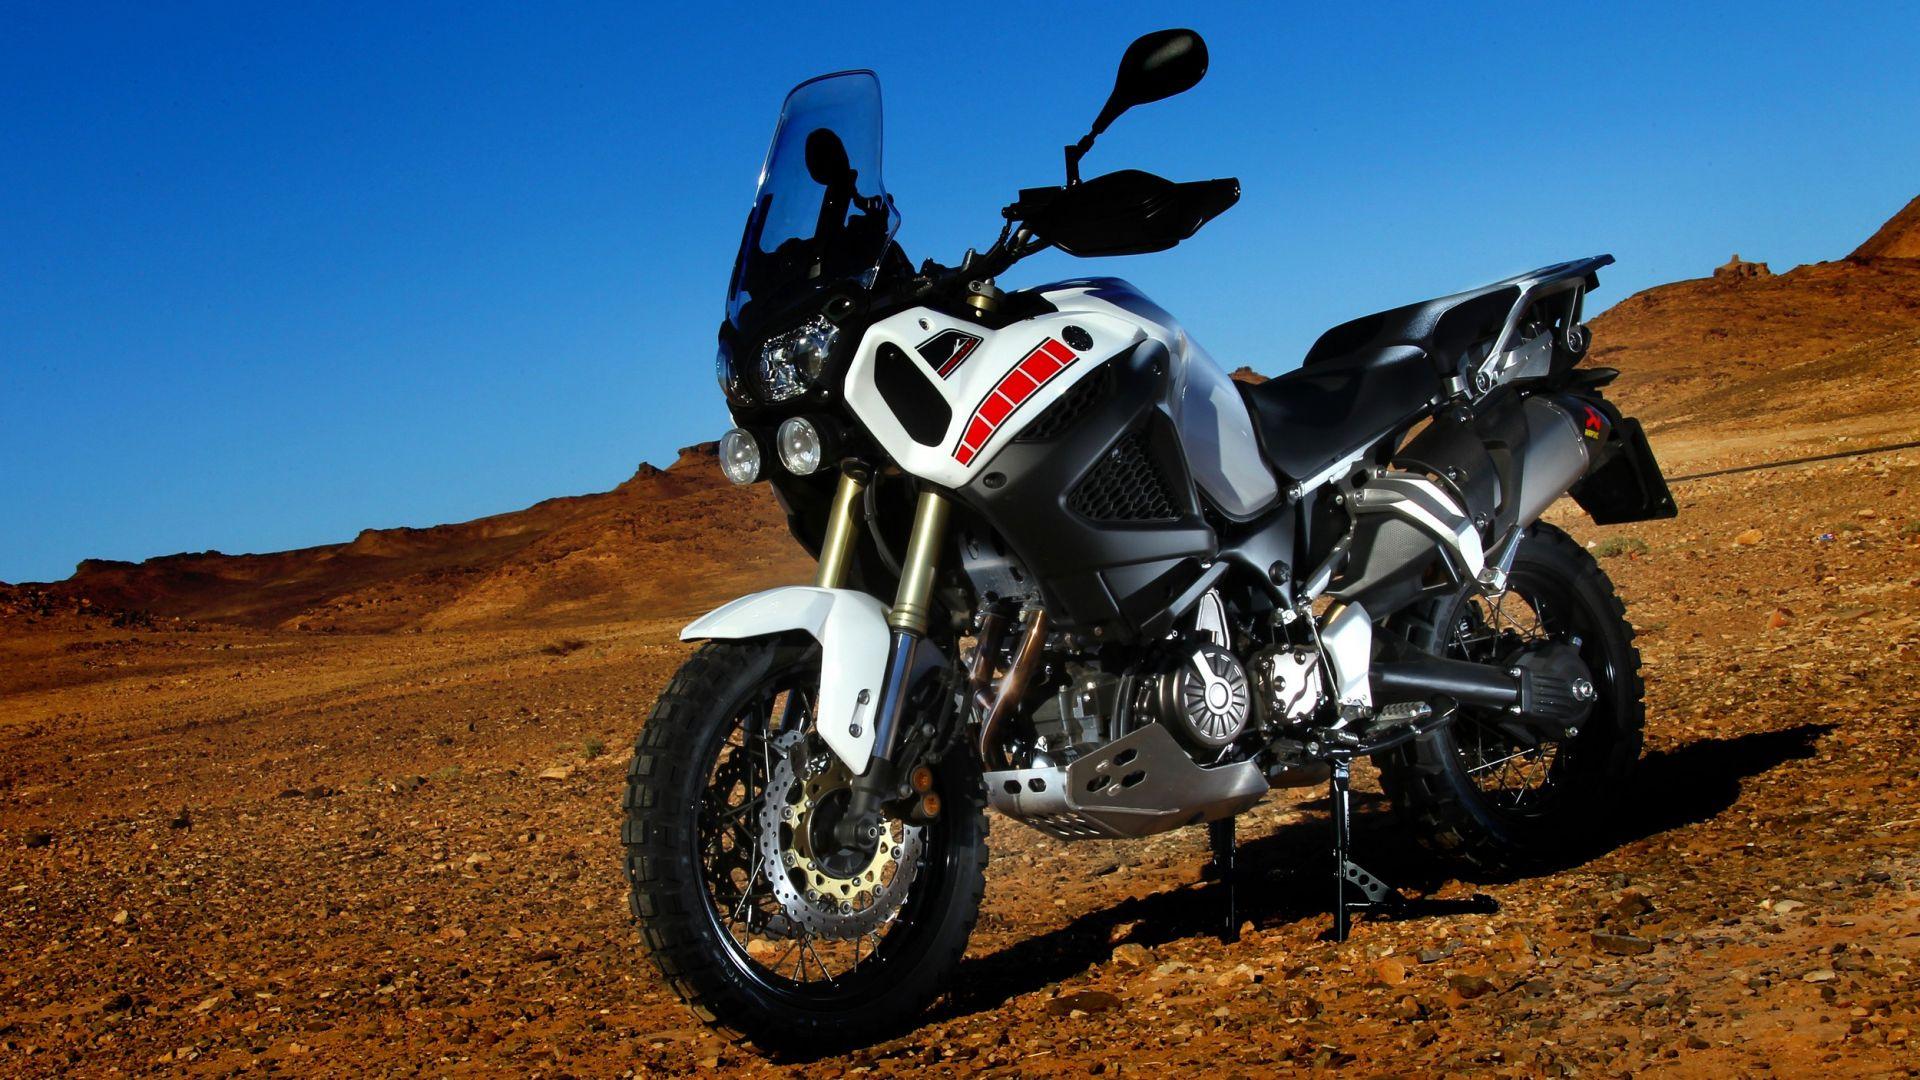 Immagine 39: In Marocco con la Yamaha Super Ténéré